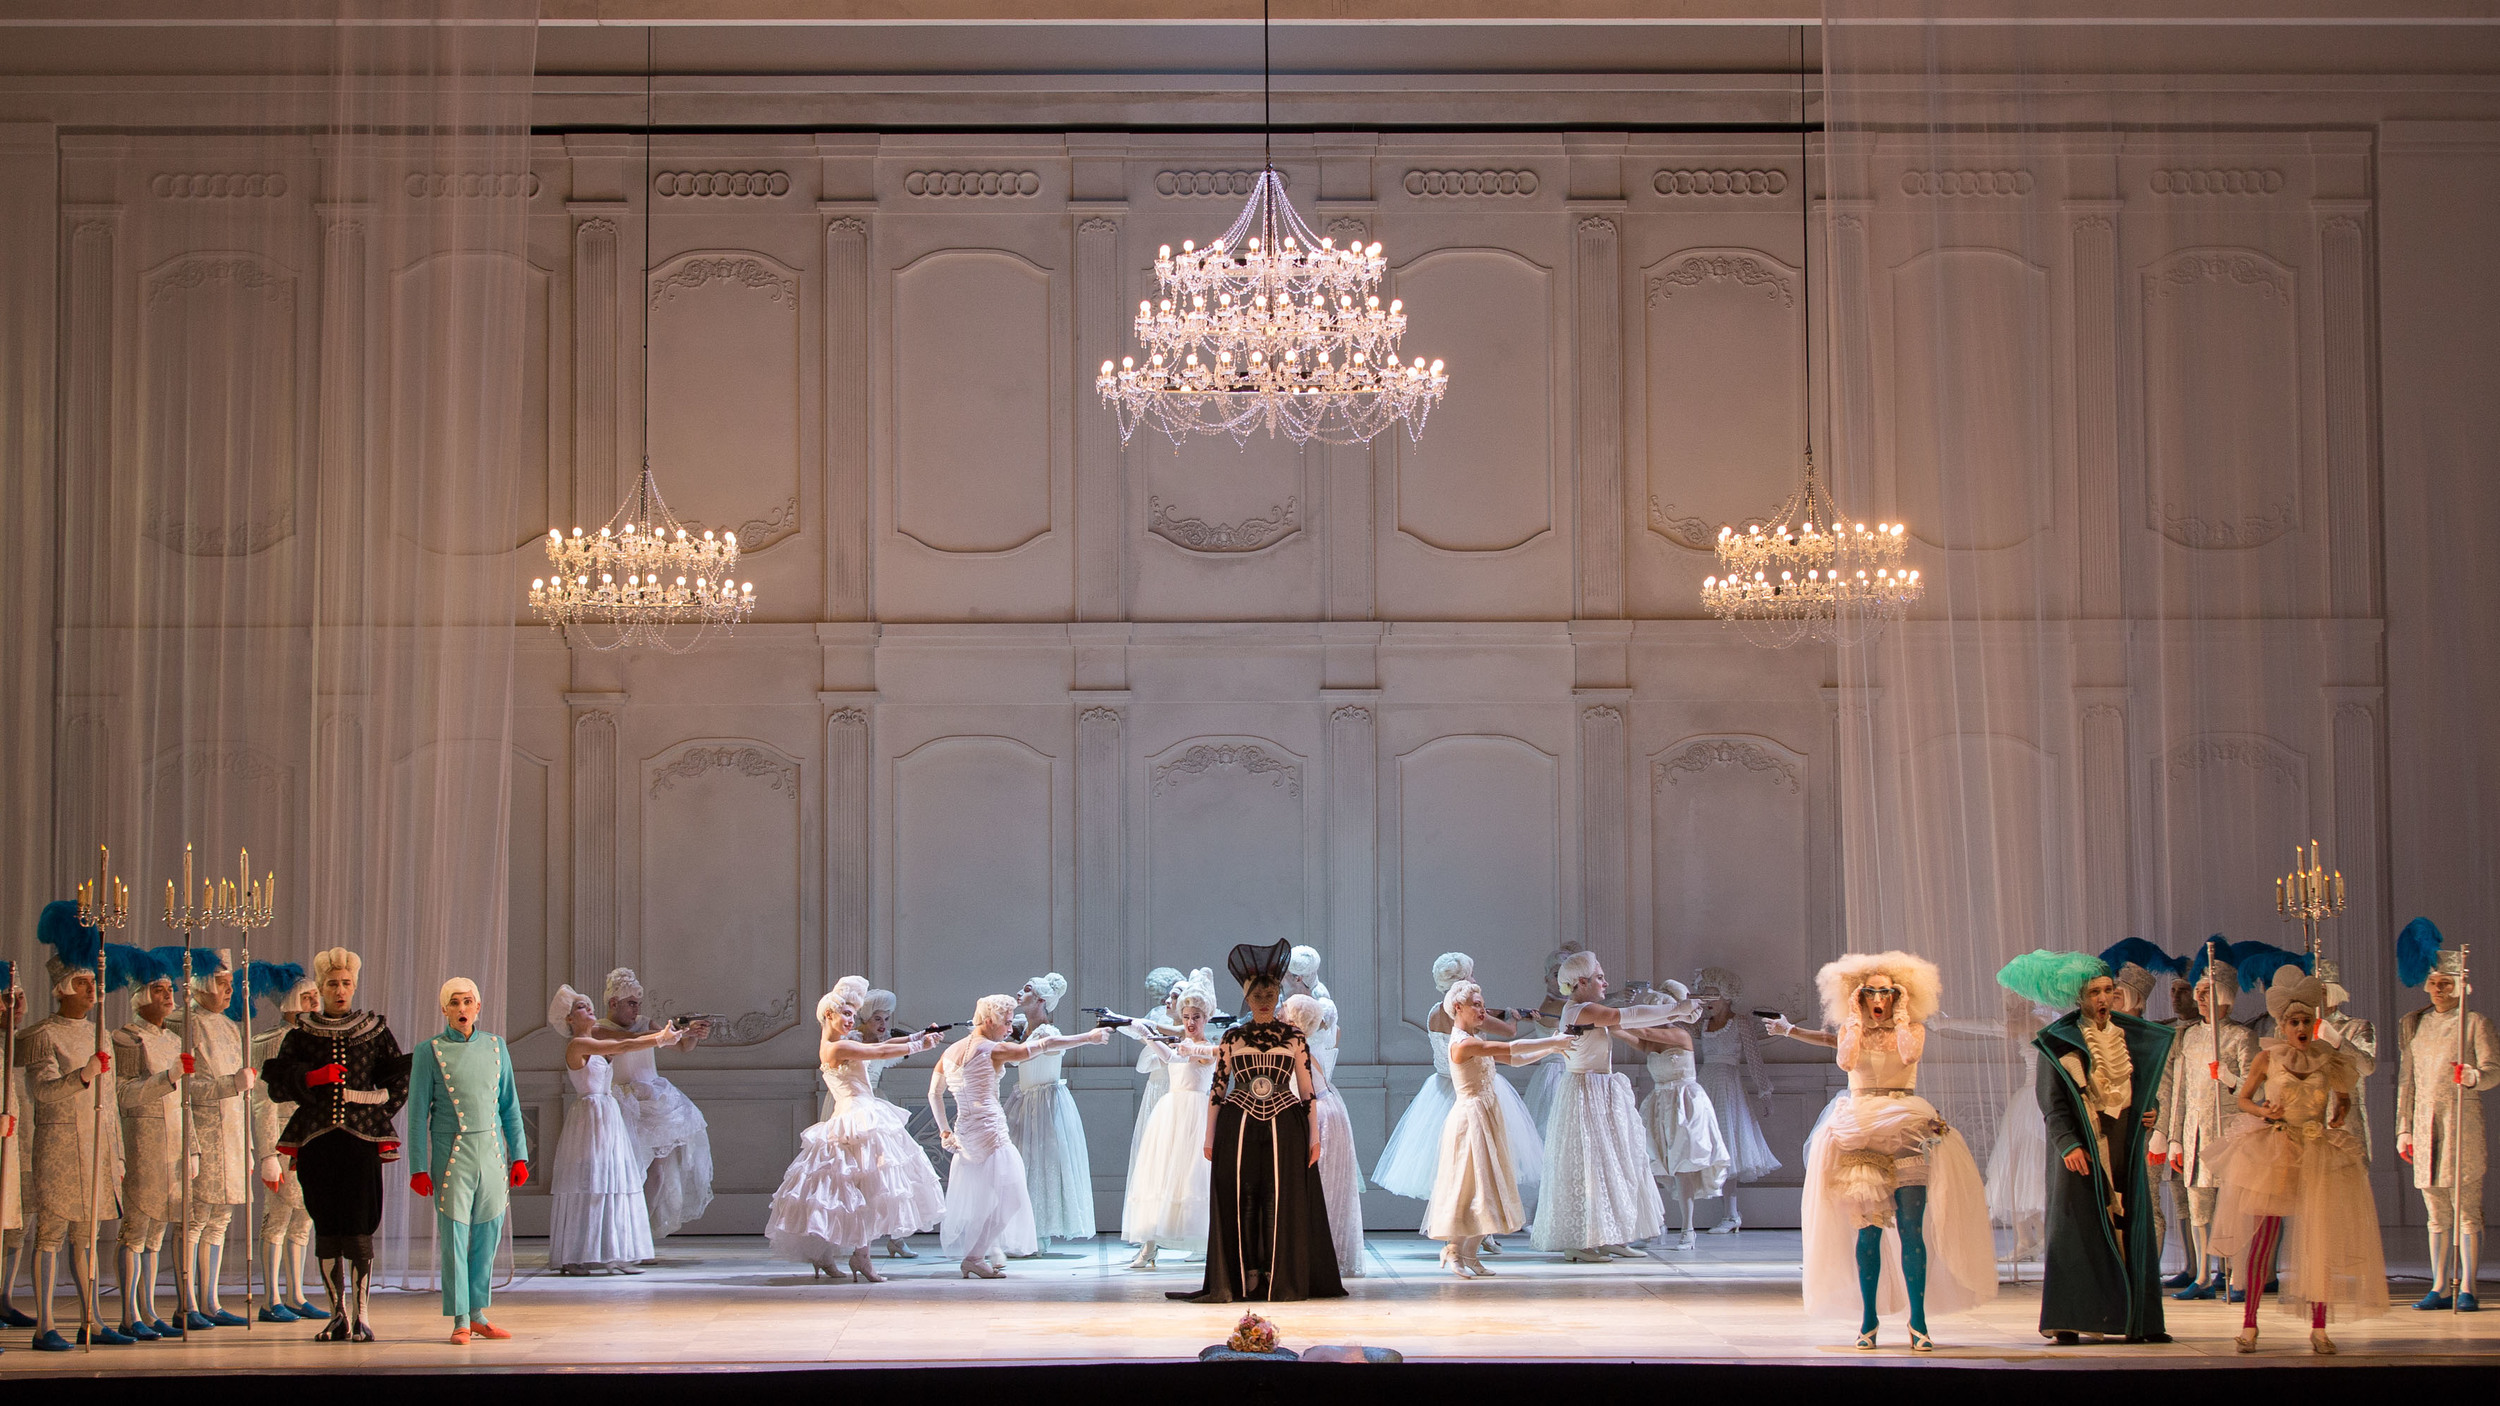 Gioacchino-Rossini-La-Cenerentola-regia-Emma-Dante-®Yasuko-Kageyama-Opera-di-Roma-2015-16.jpg